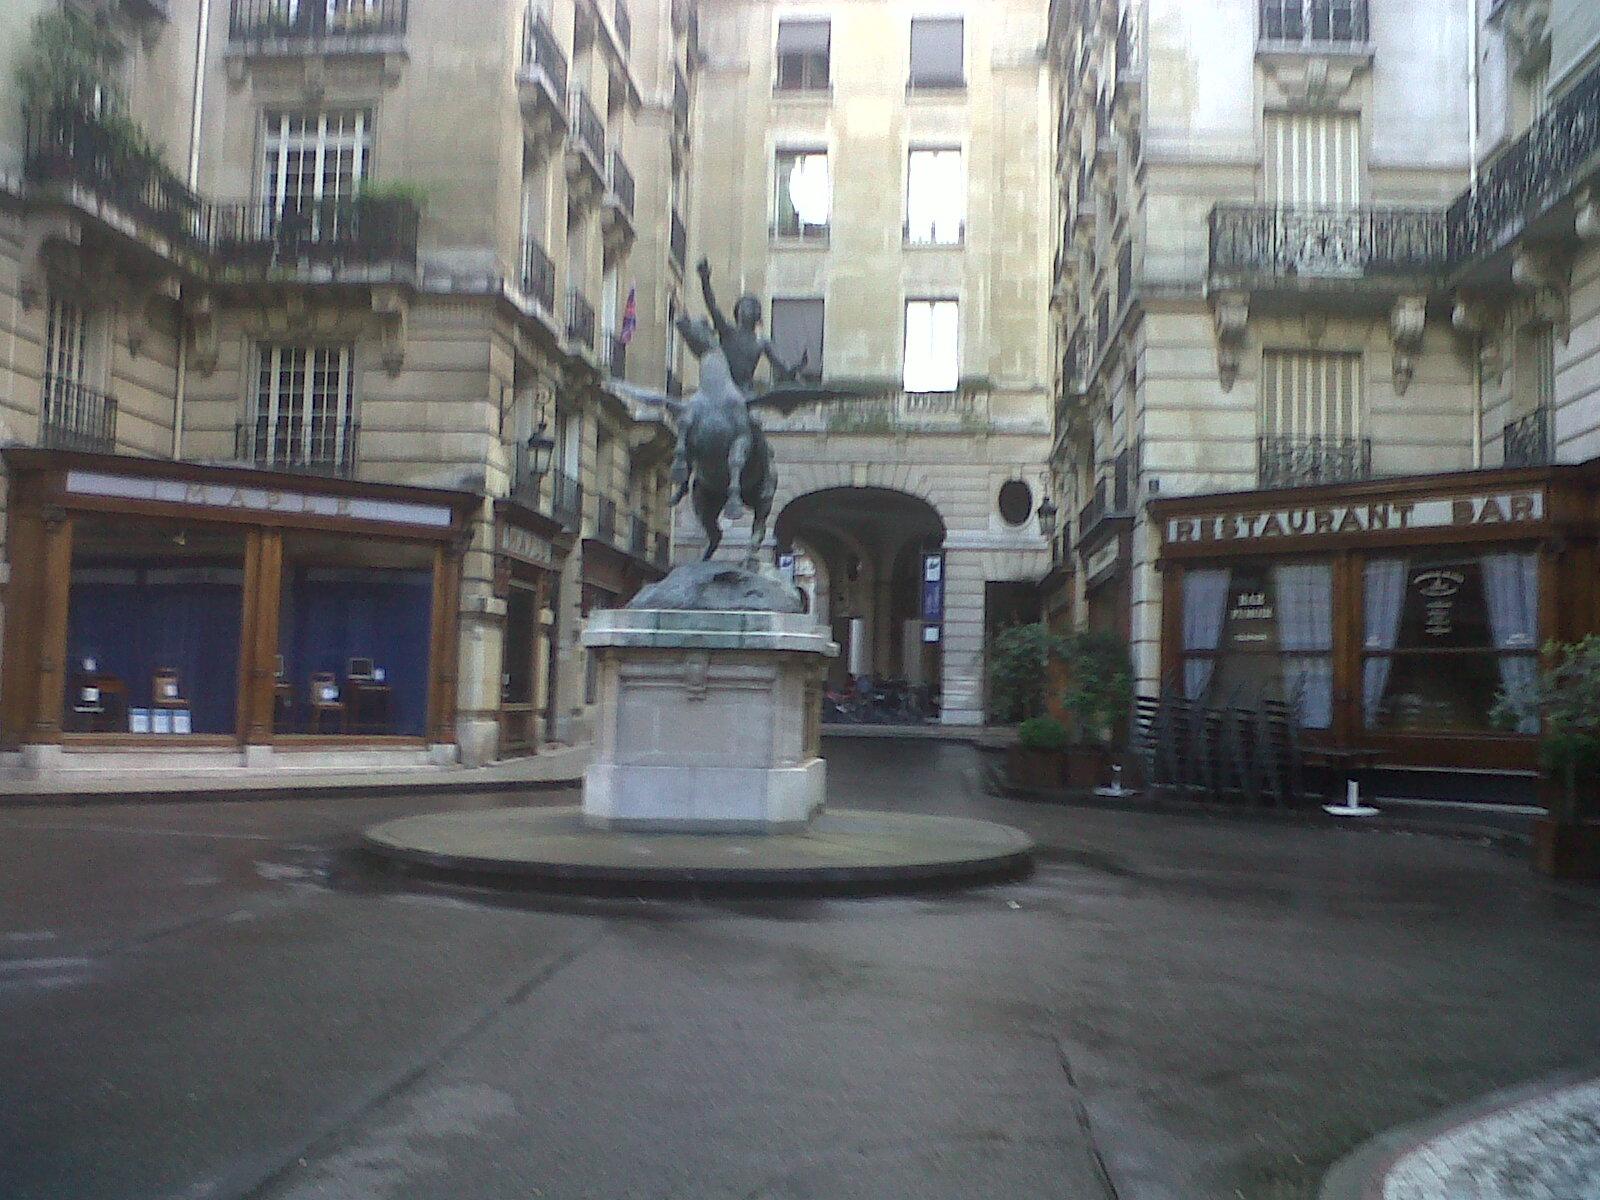 paris-pl-eduard-vii-statue-apr12